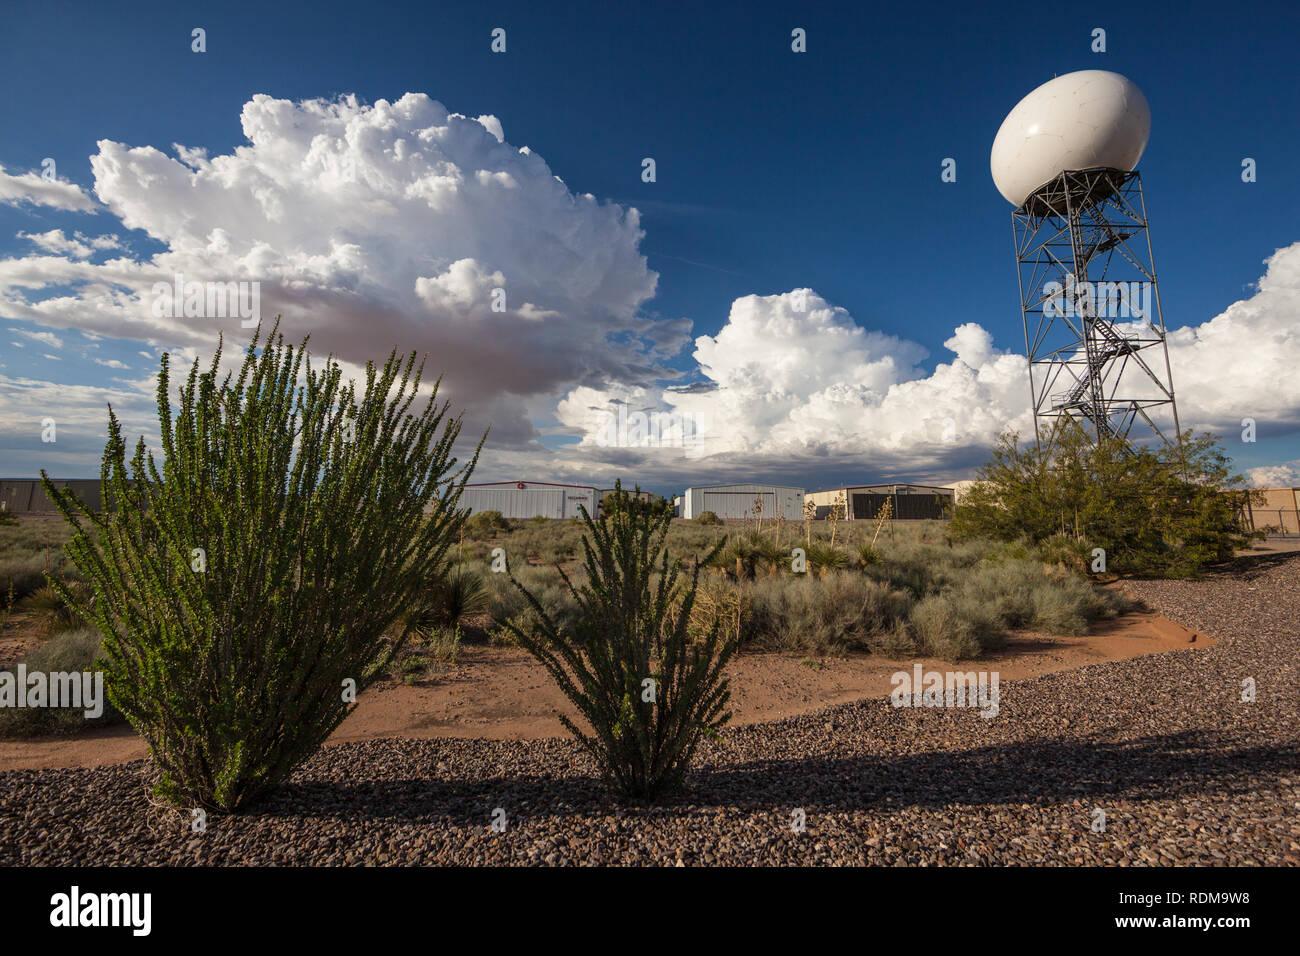 Weather Radar Tower Stock Photos & Weather Radar Tower Stock Images